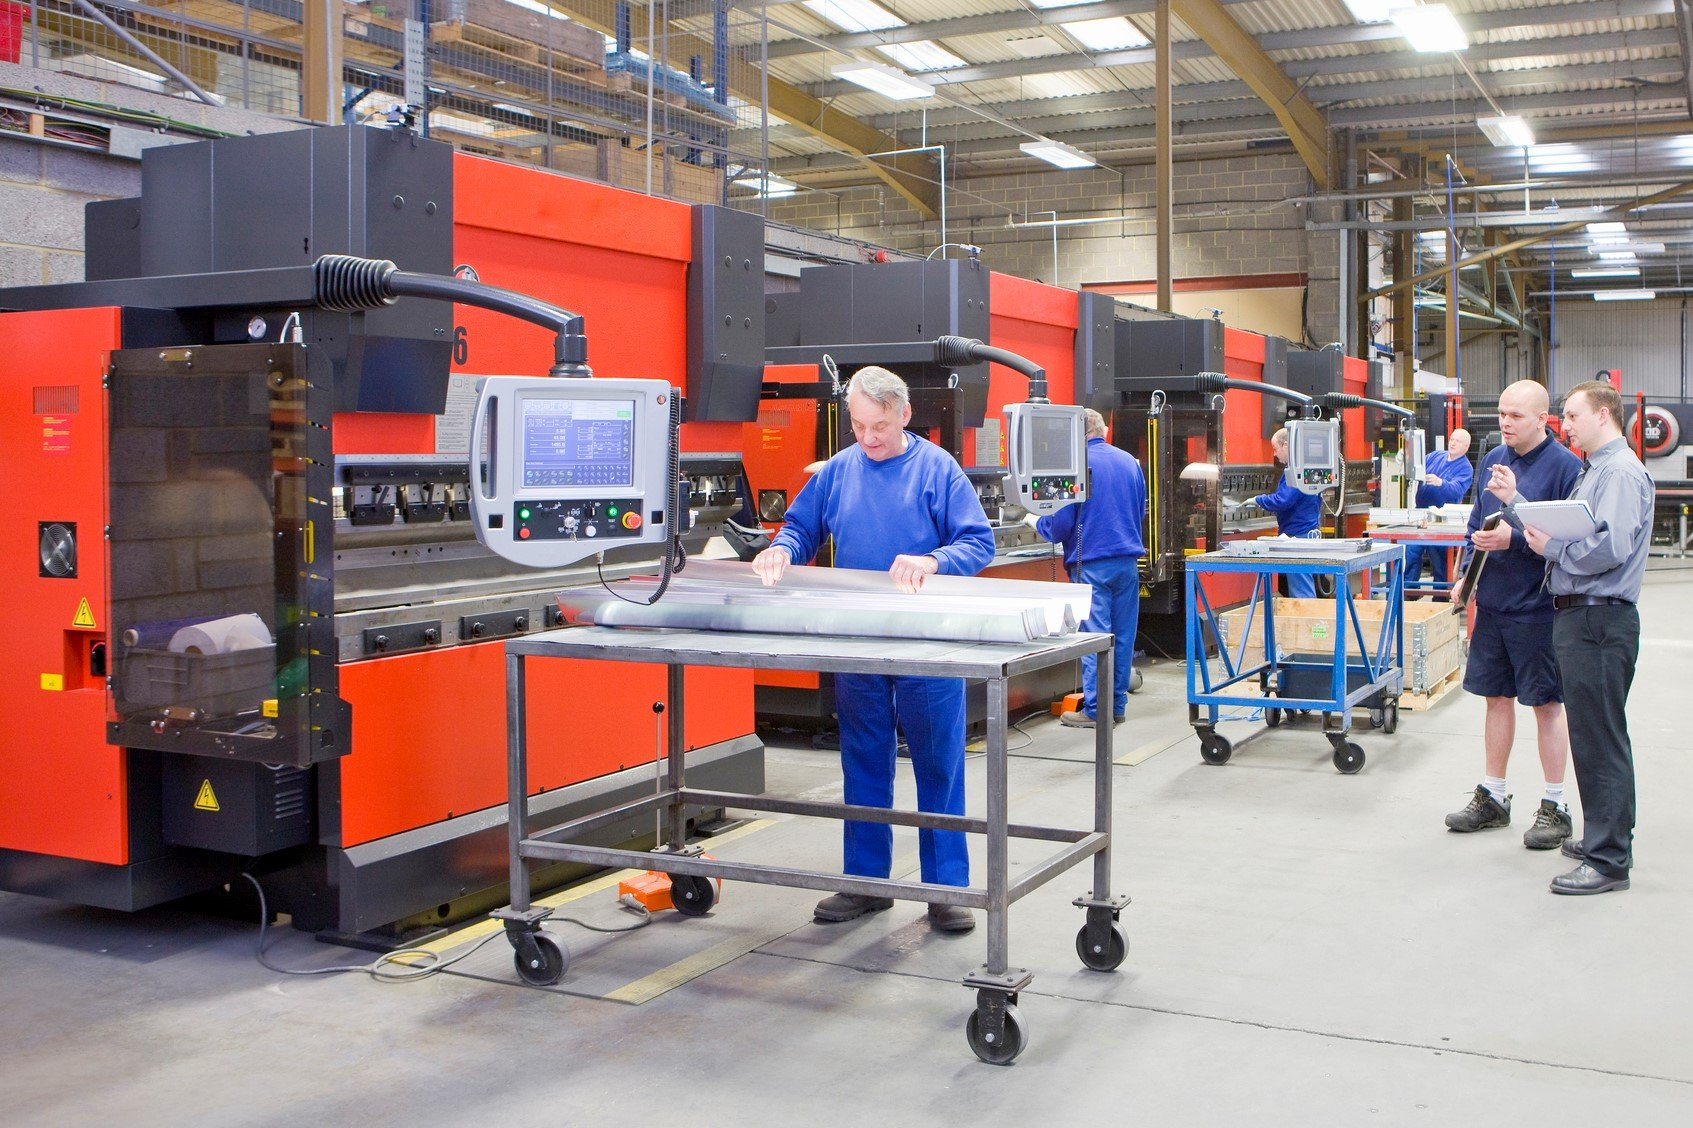 Sheetmetal Fabrication R Amp D Tax Credit